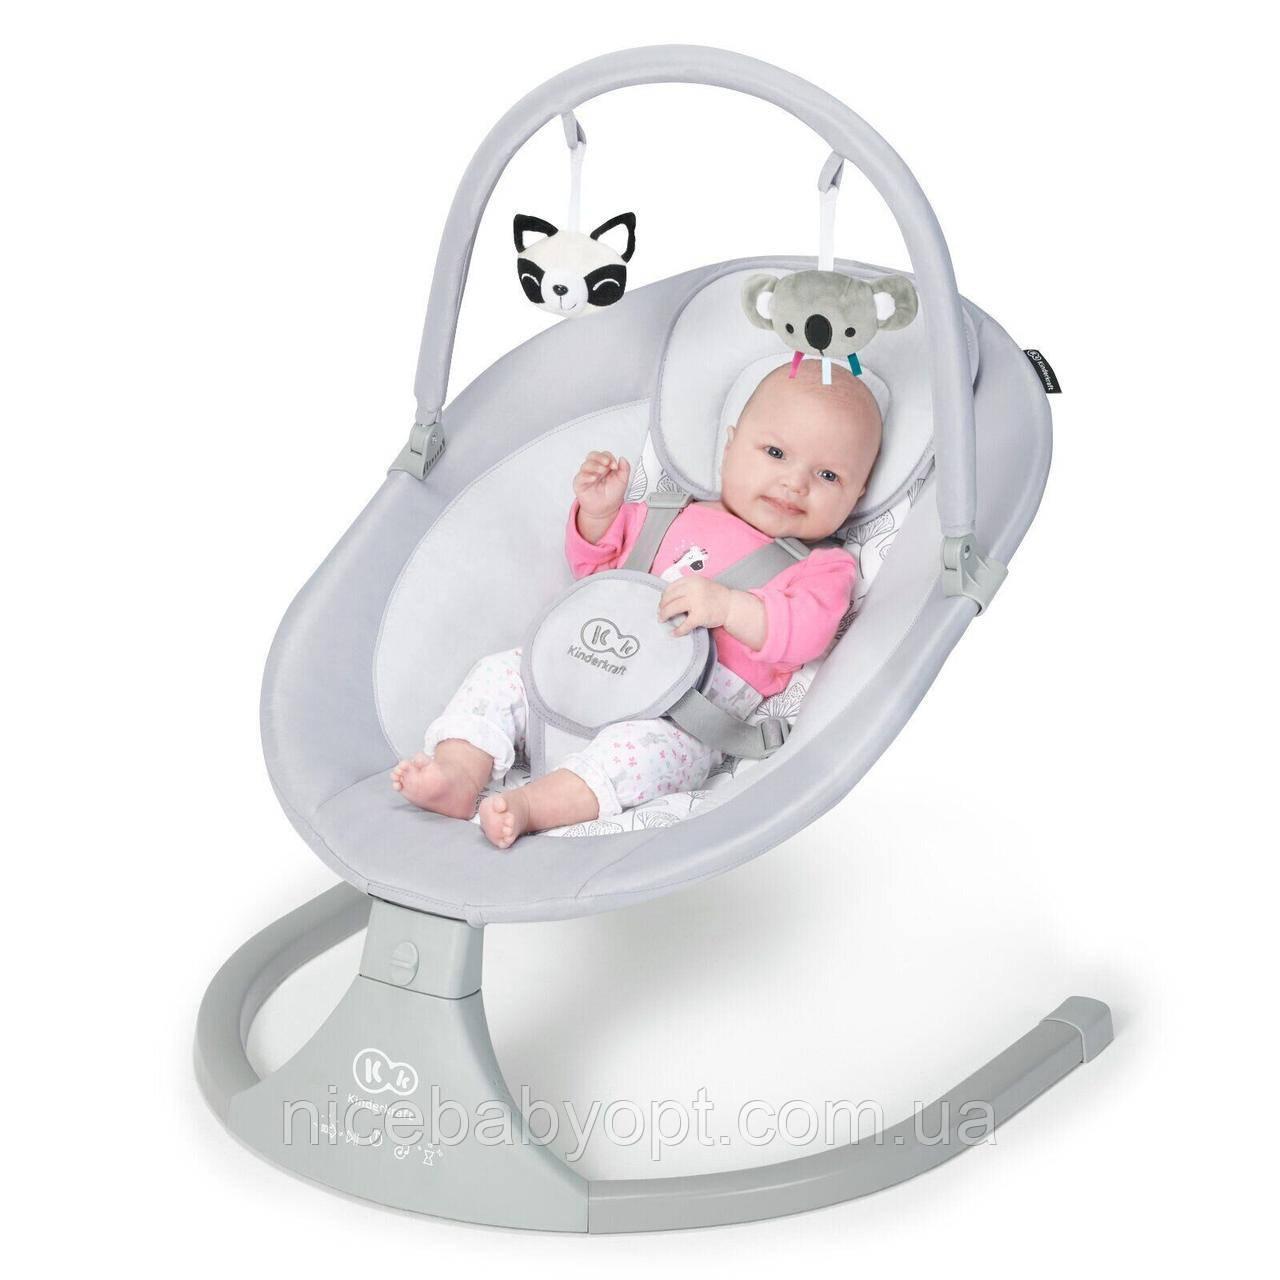 Крісло-гойдалка Kinderkraft Luli Gray